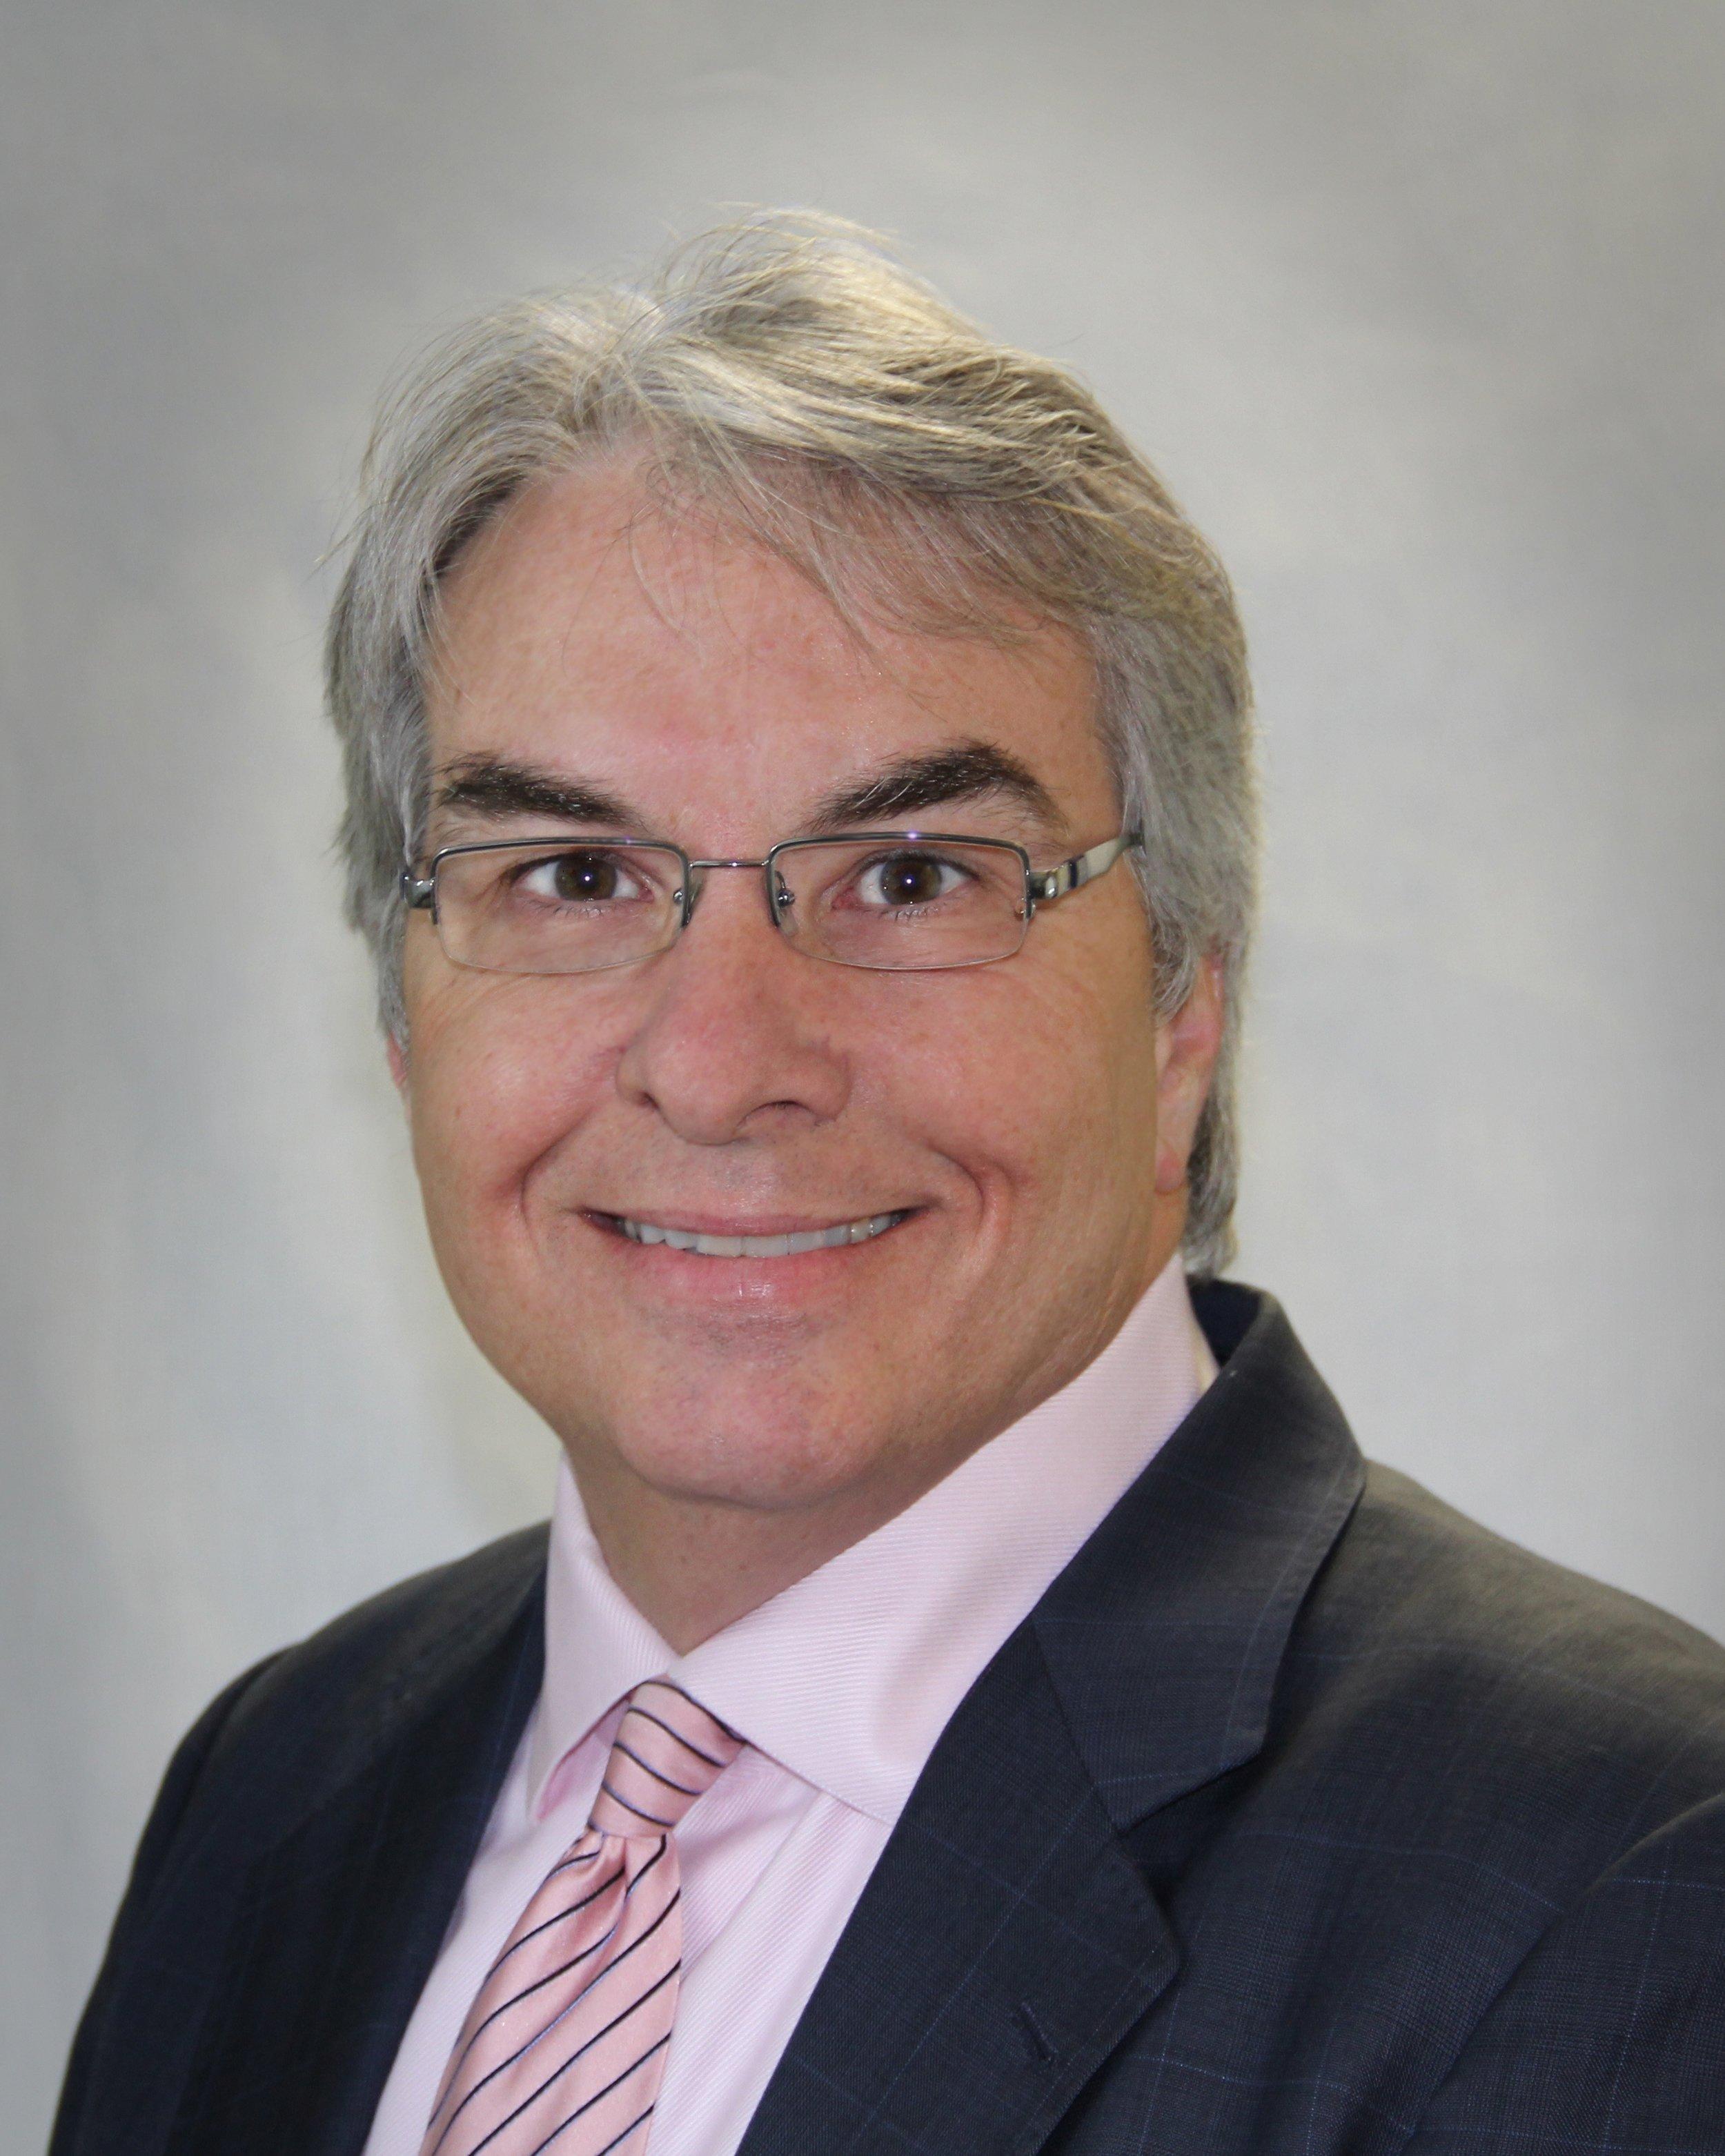 John Pappanastos Headshot